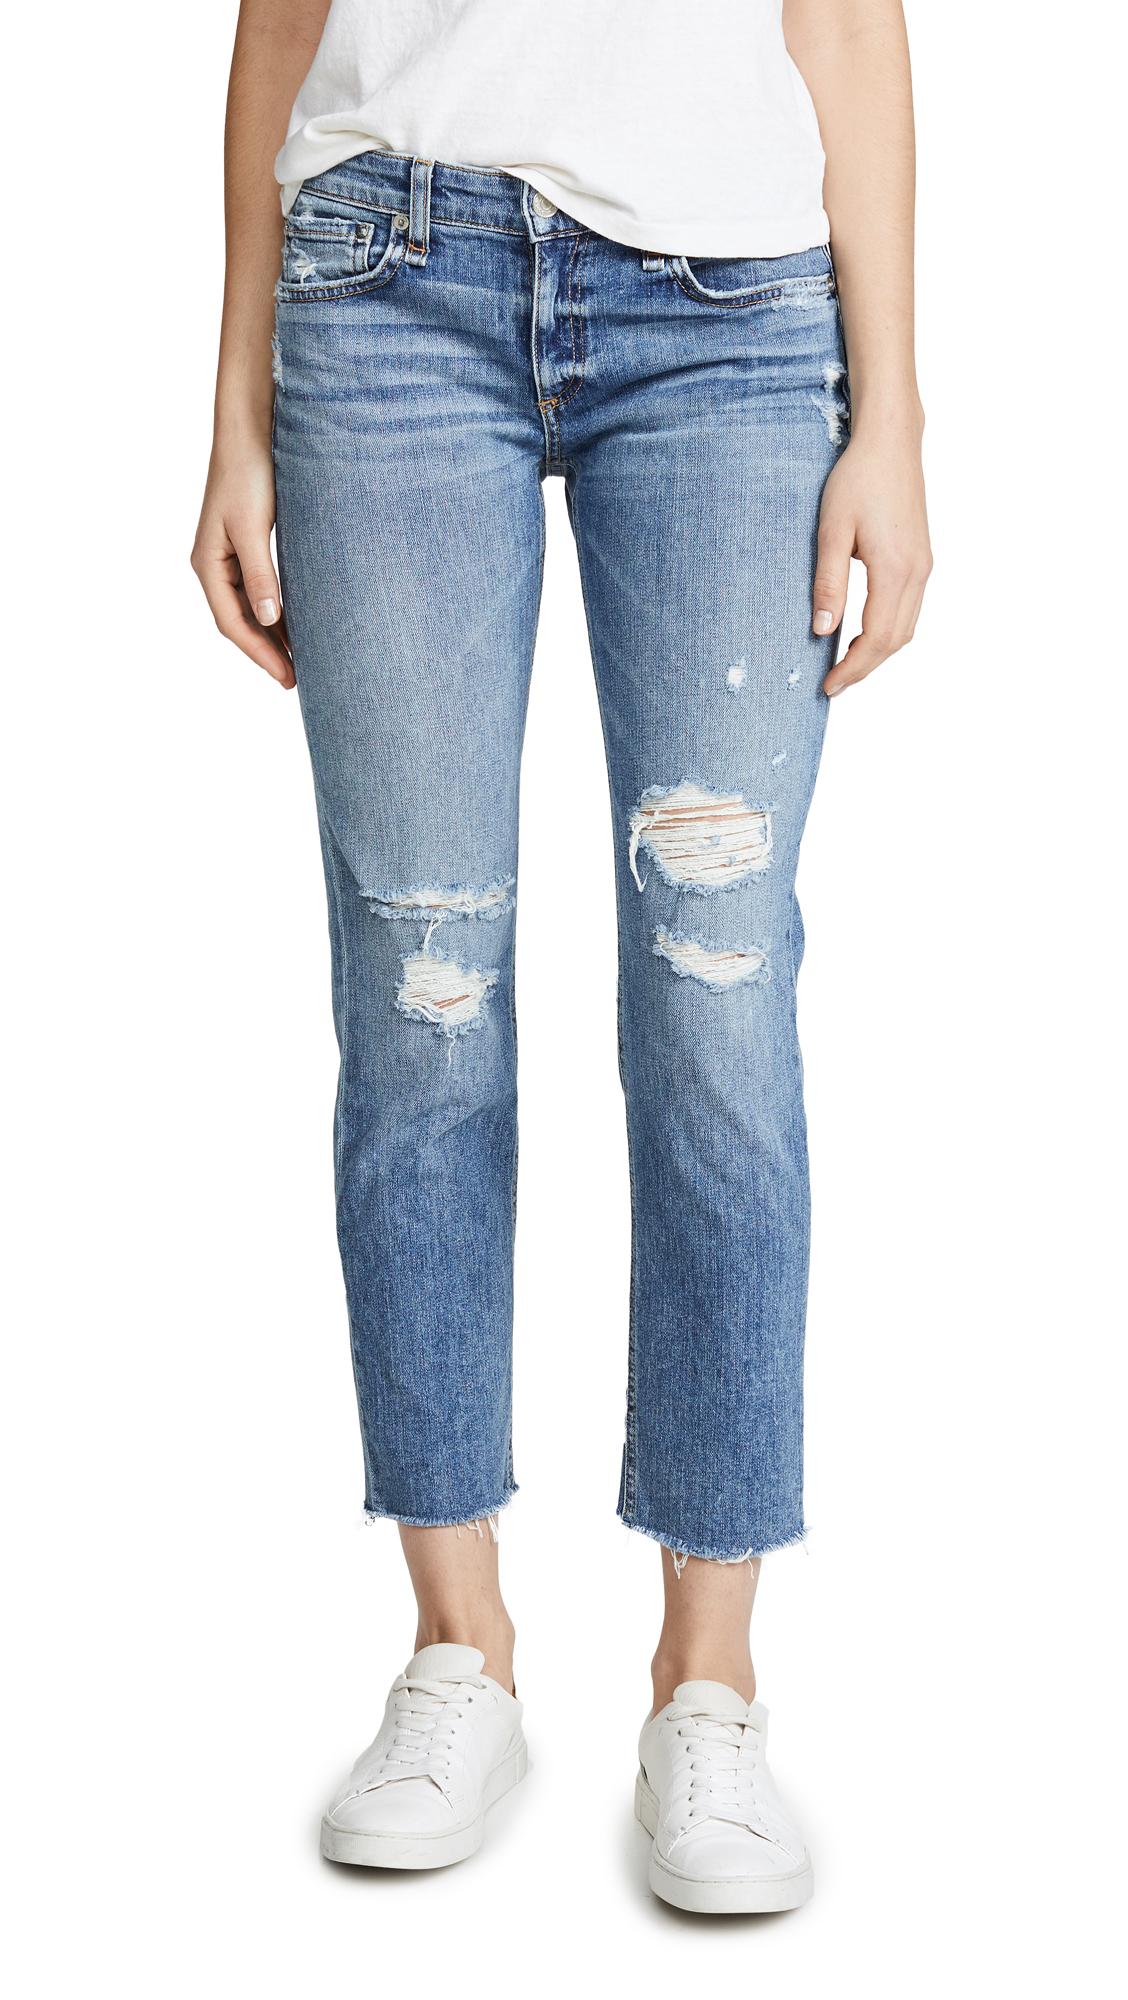 Buy Rag & Bone/JEAN online - photo of Rag & Bone/JEAN Dre Ankle Jeans